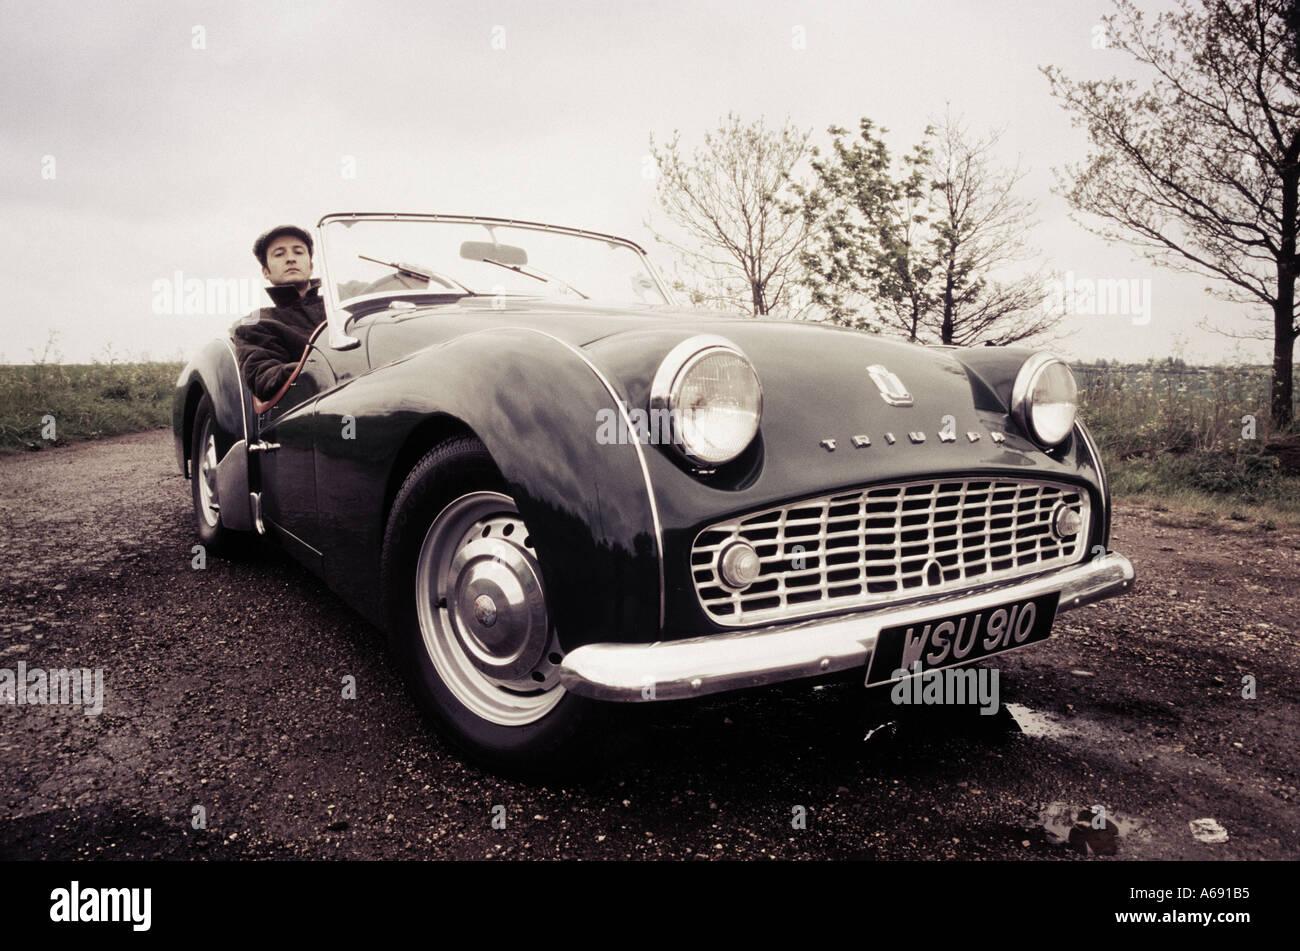 posh bloke with car 2 - Stock Image